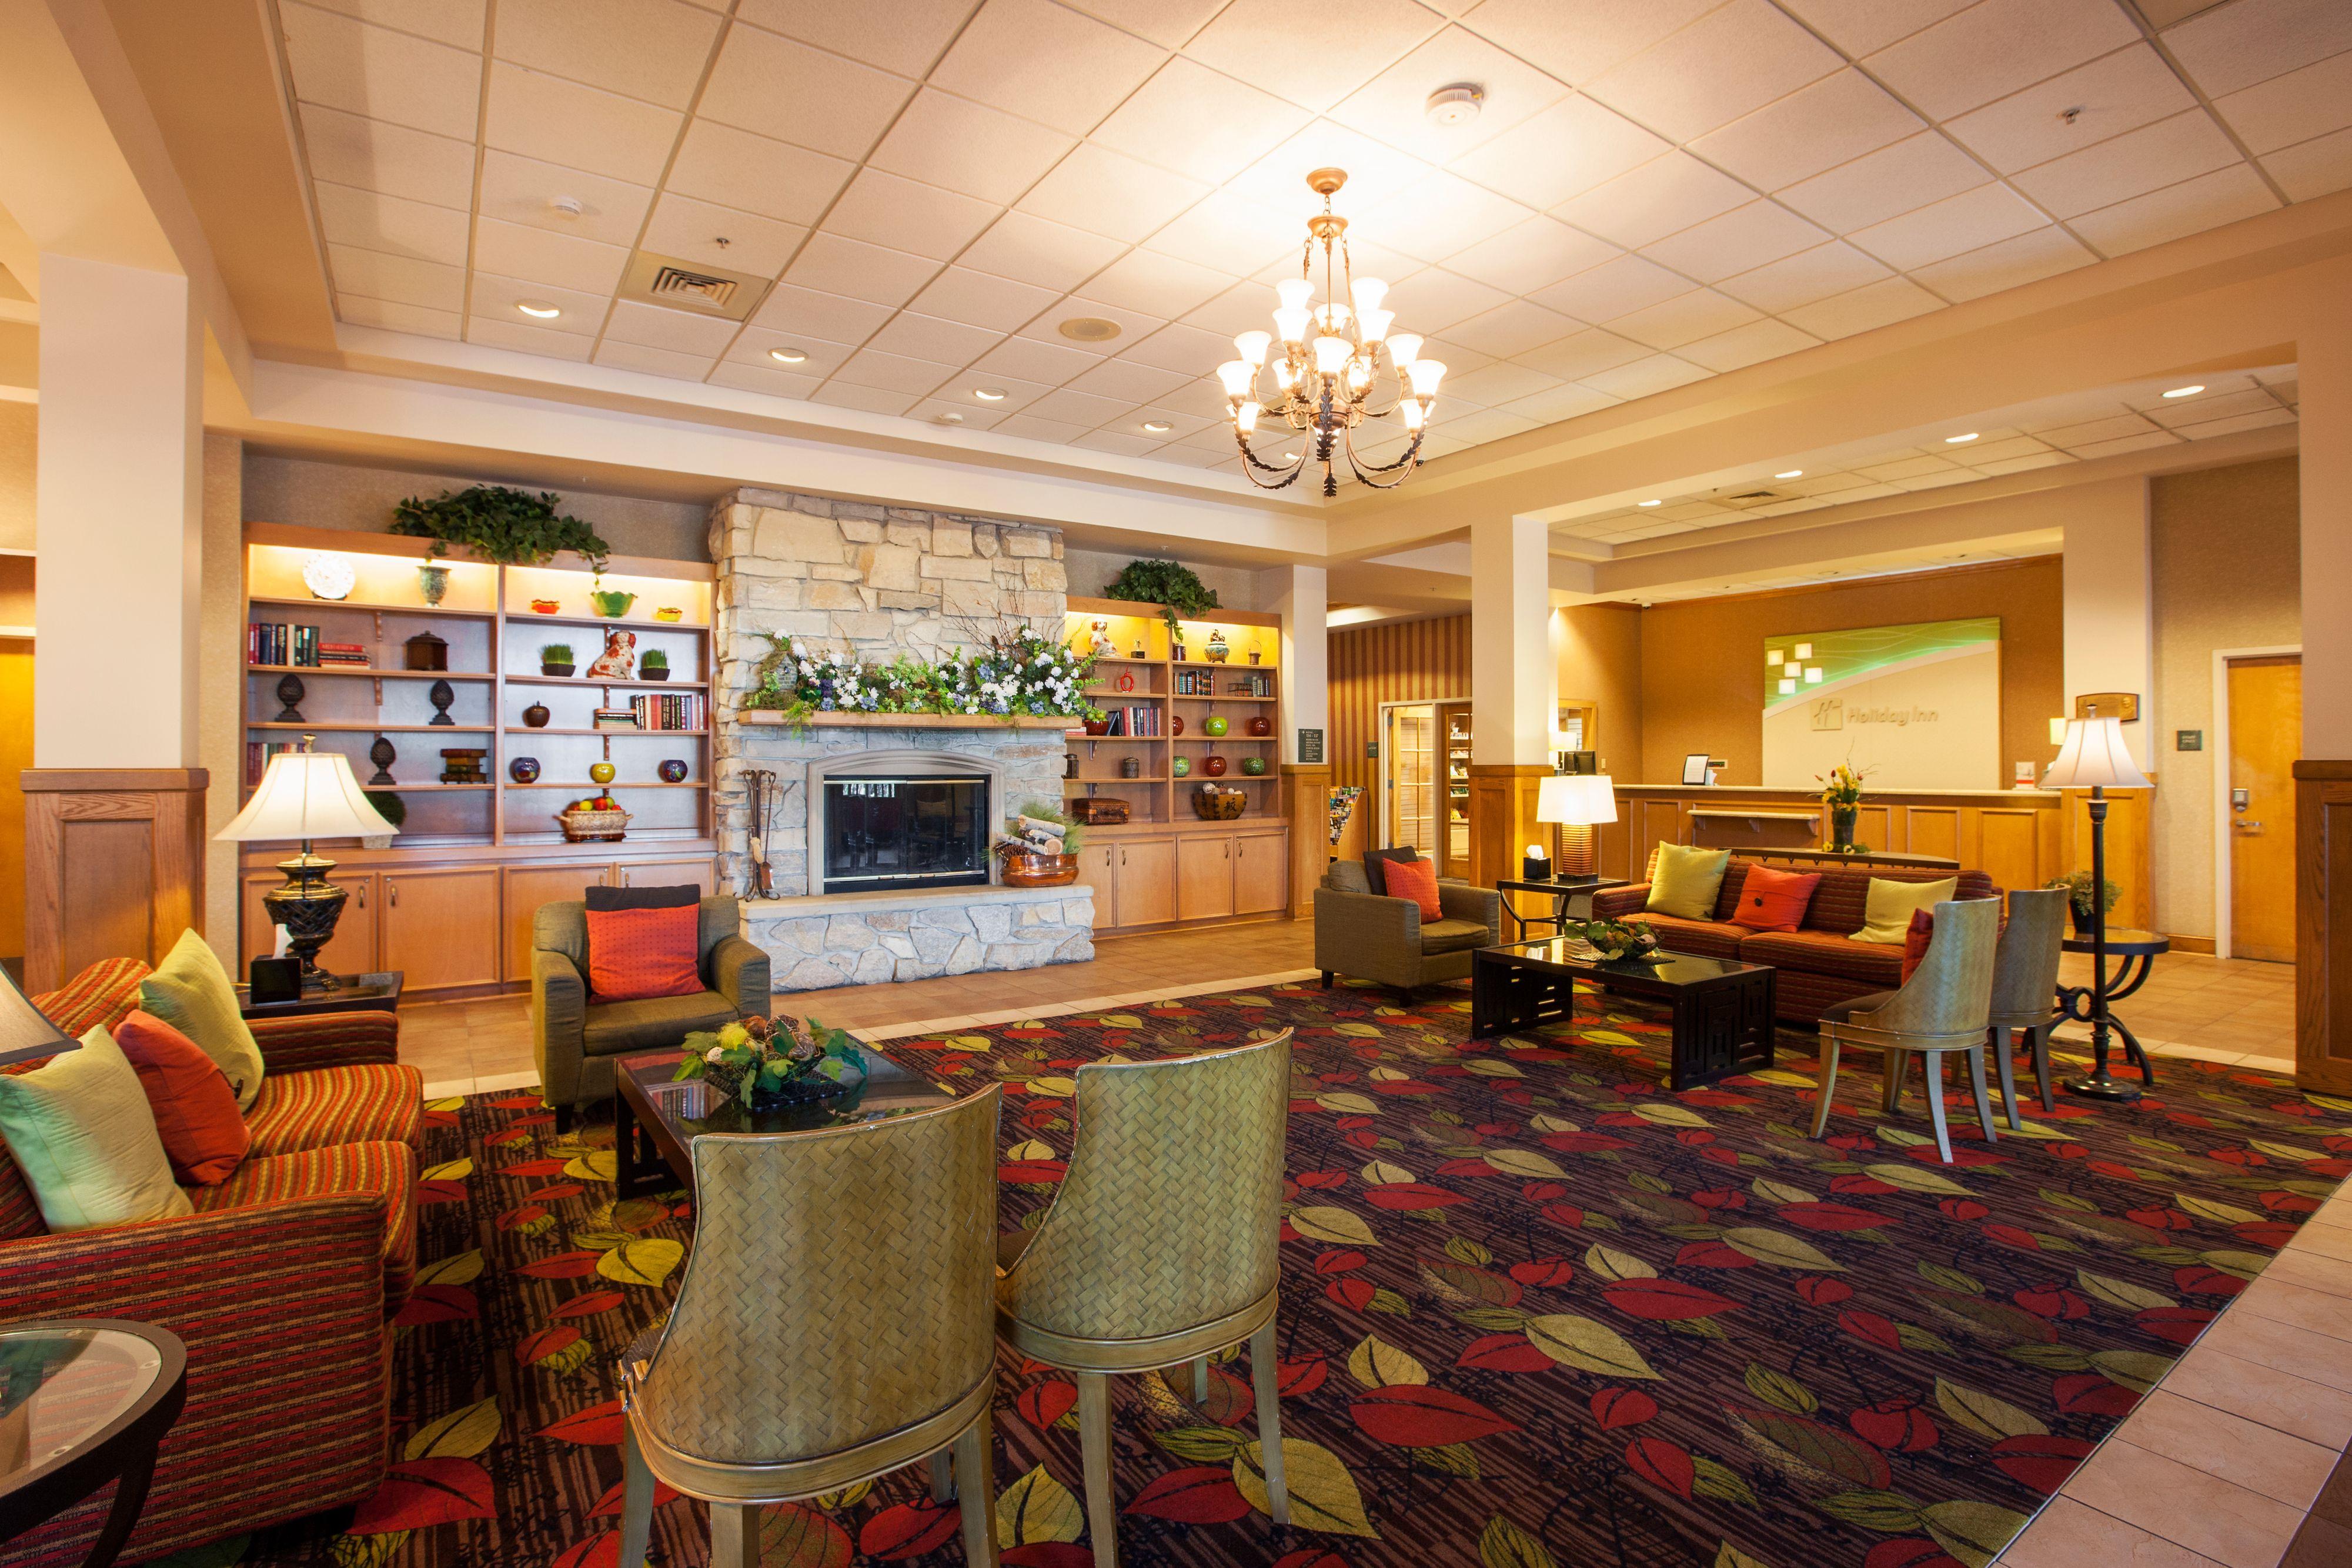 Holiday Inn Chicago-Tinley Park-Conv Ctr image 5